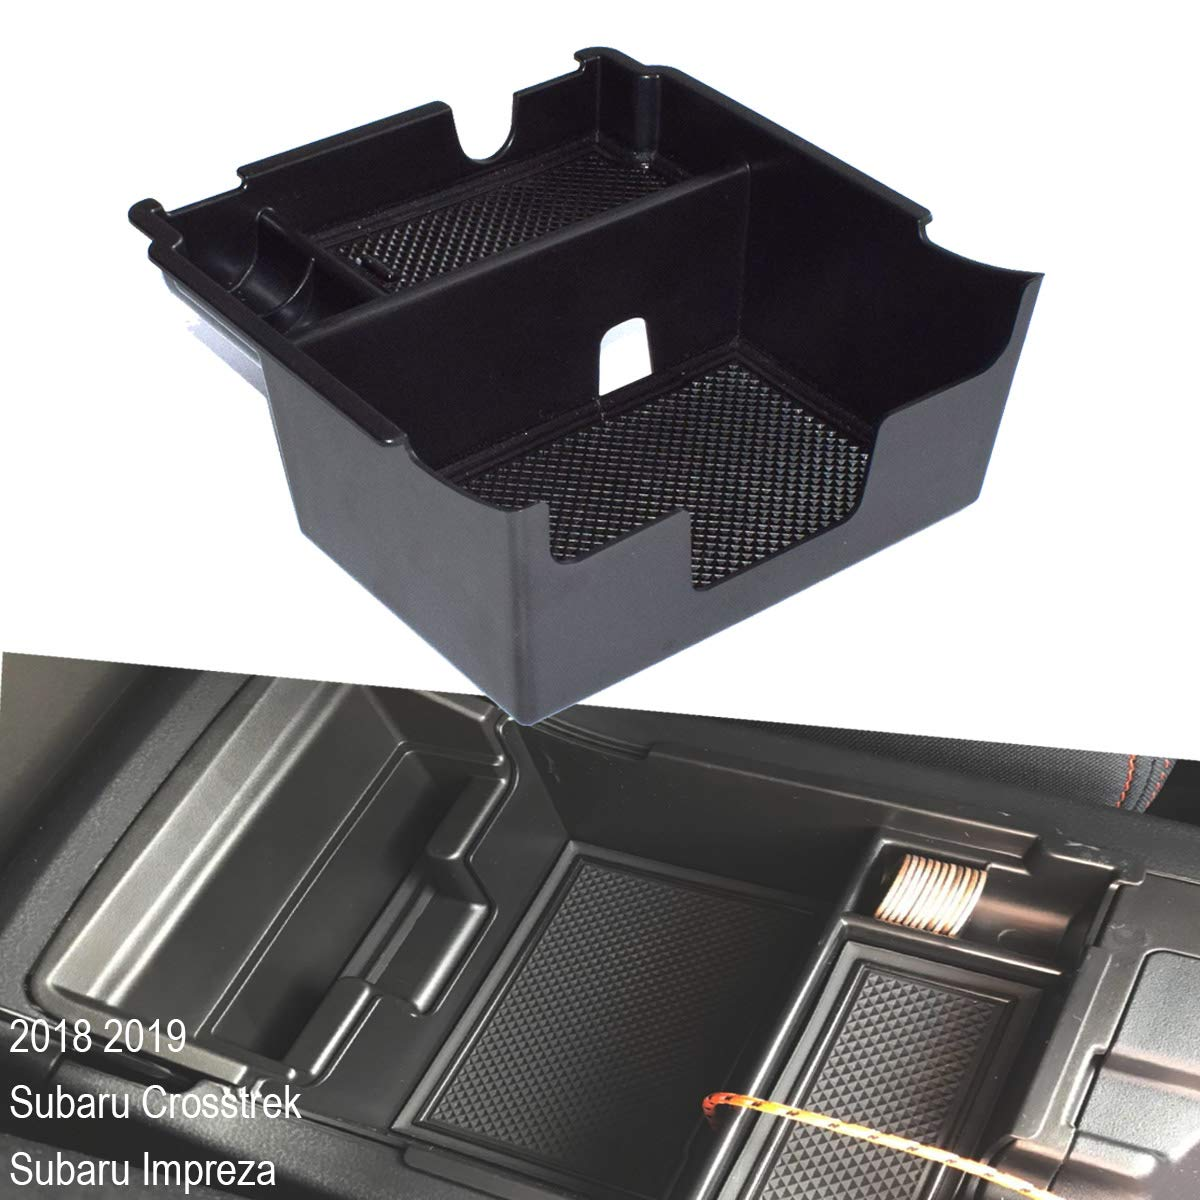 EDBETOS Organizer for Subaru Crosstrek Subaru Impreza 2018 2019 Center Console Armrest Organizer Accessories Tray, Armrest Box Secondary Storage